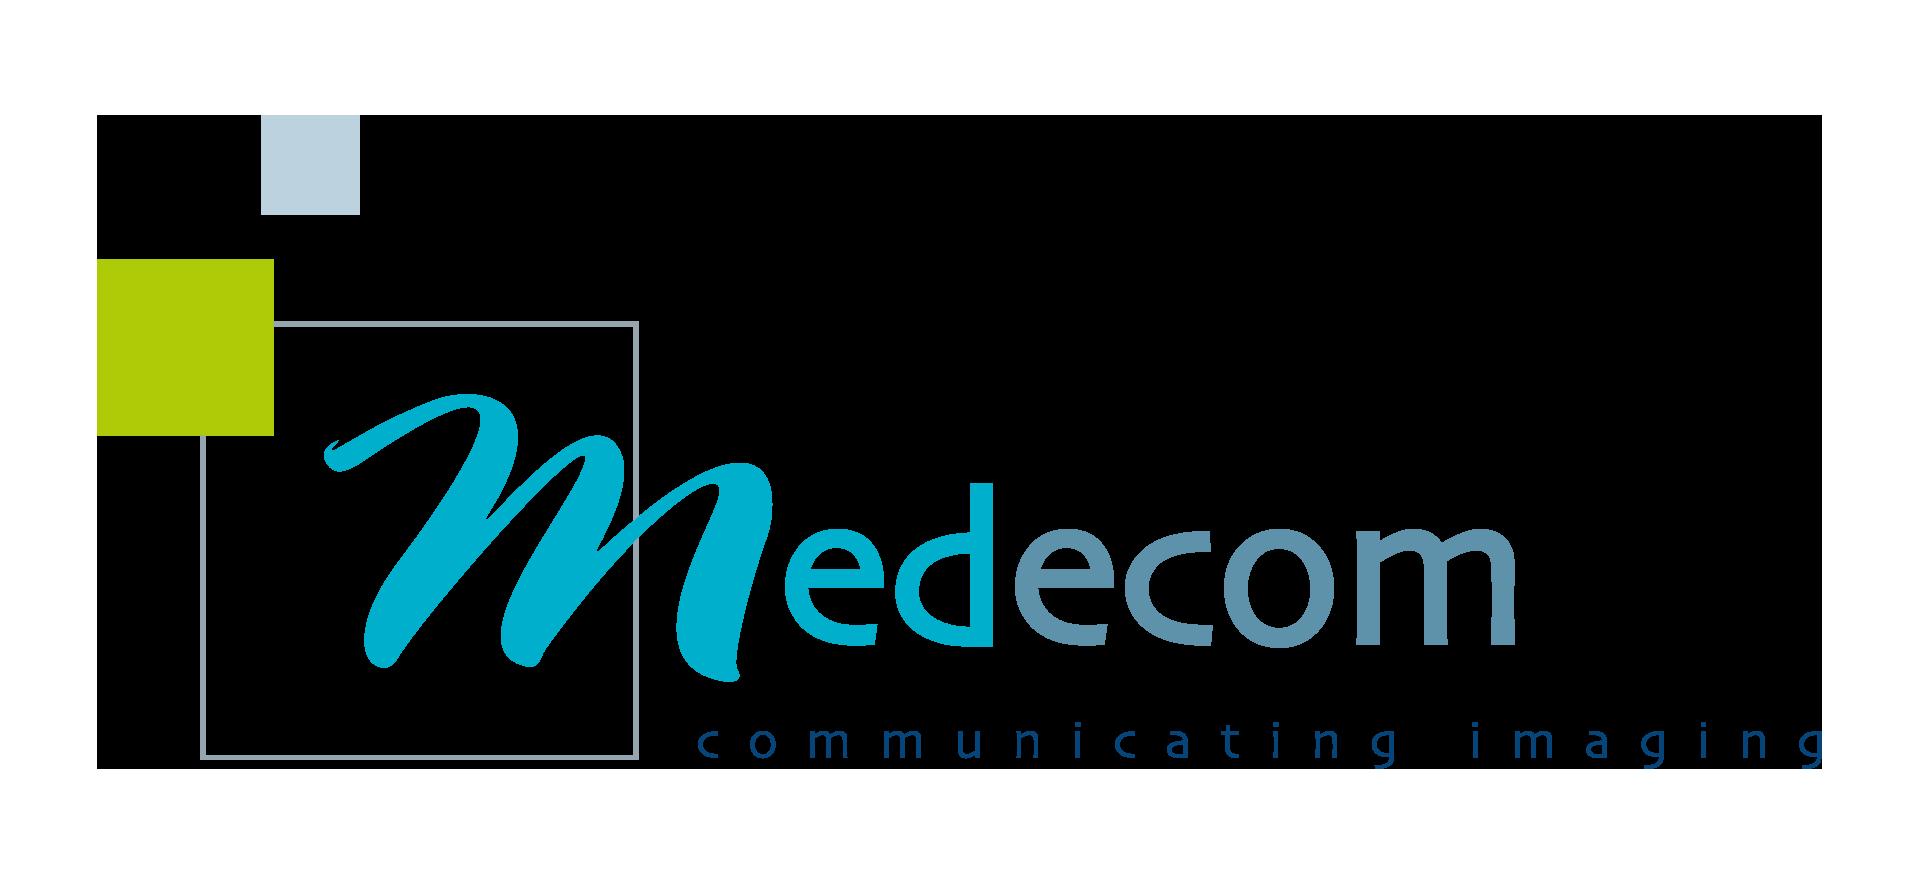 Medecom's Logo - Communicating Imaging